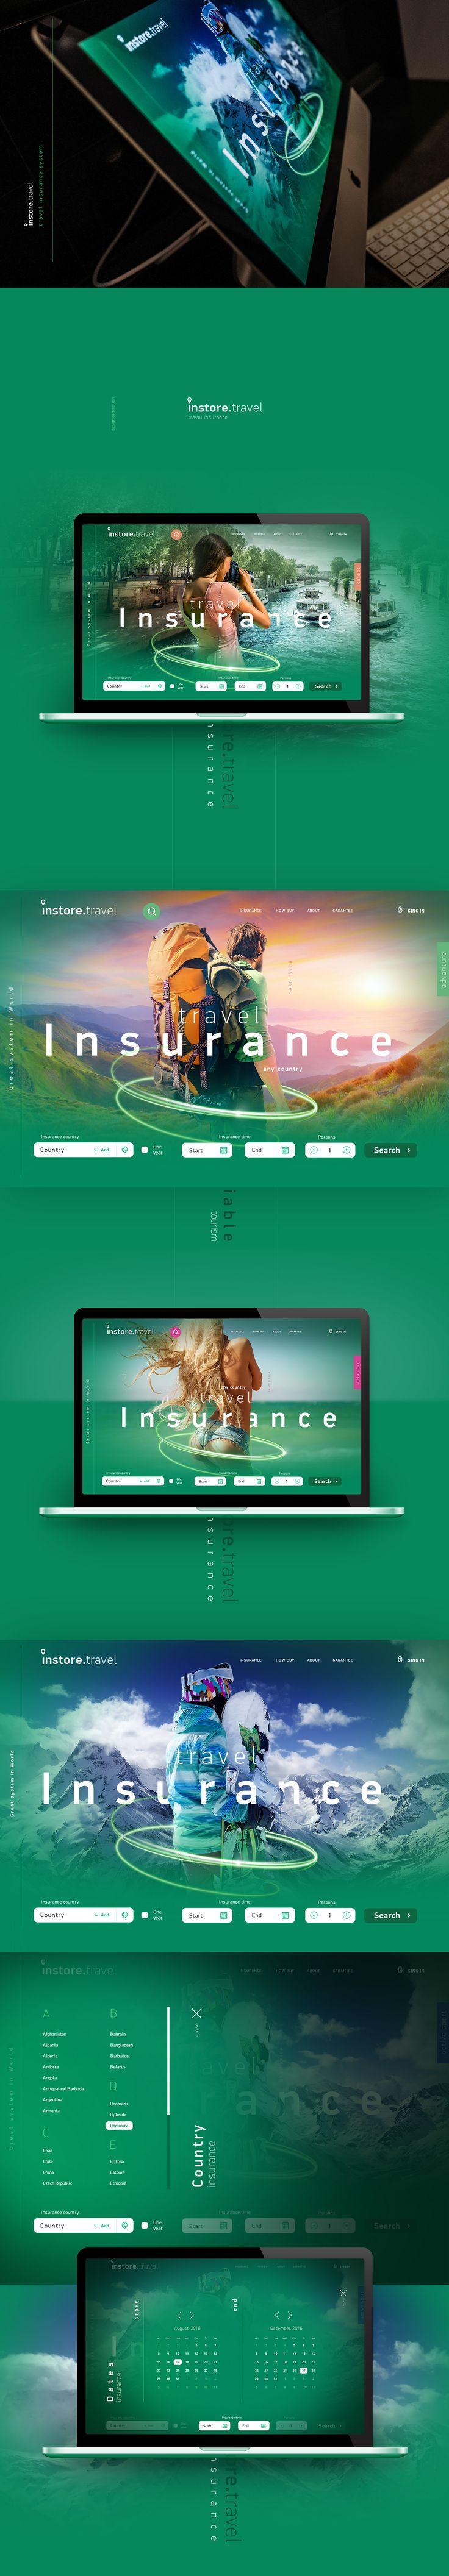 Travel insurance concept web-design